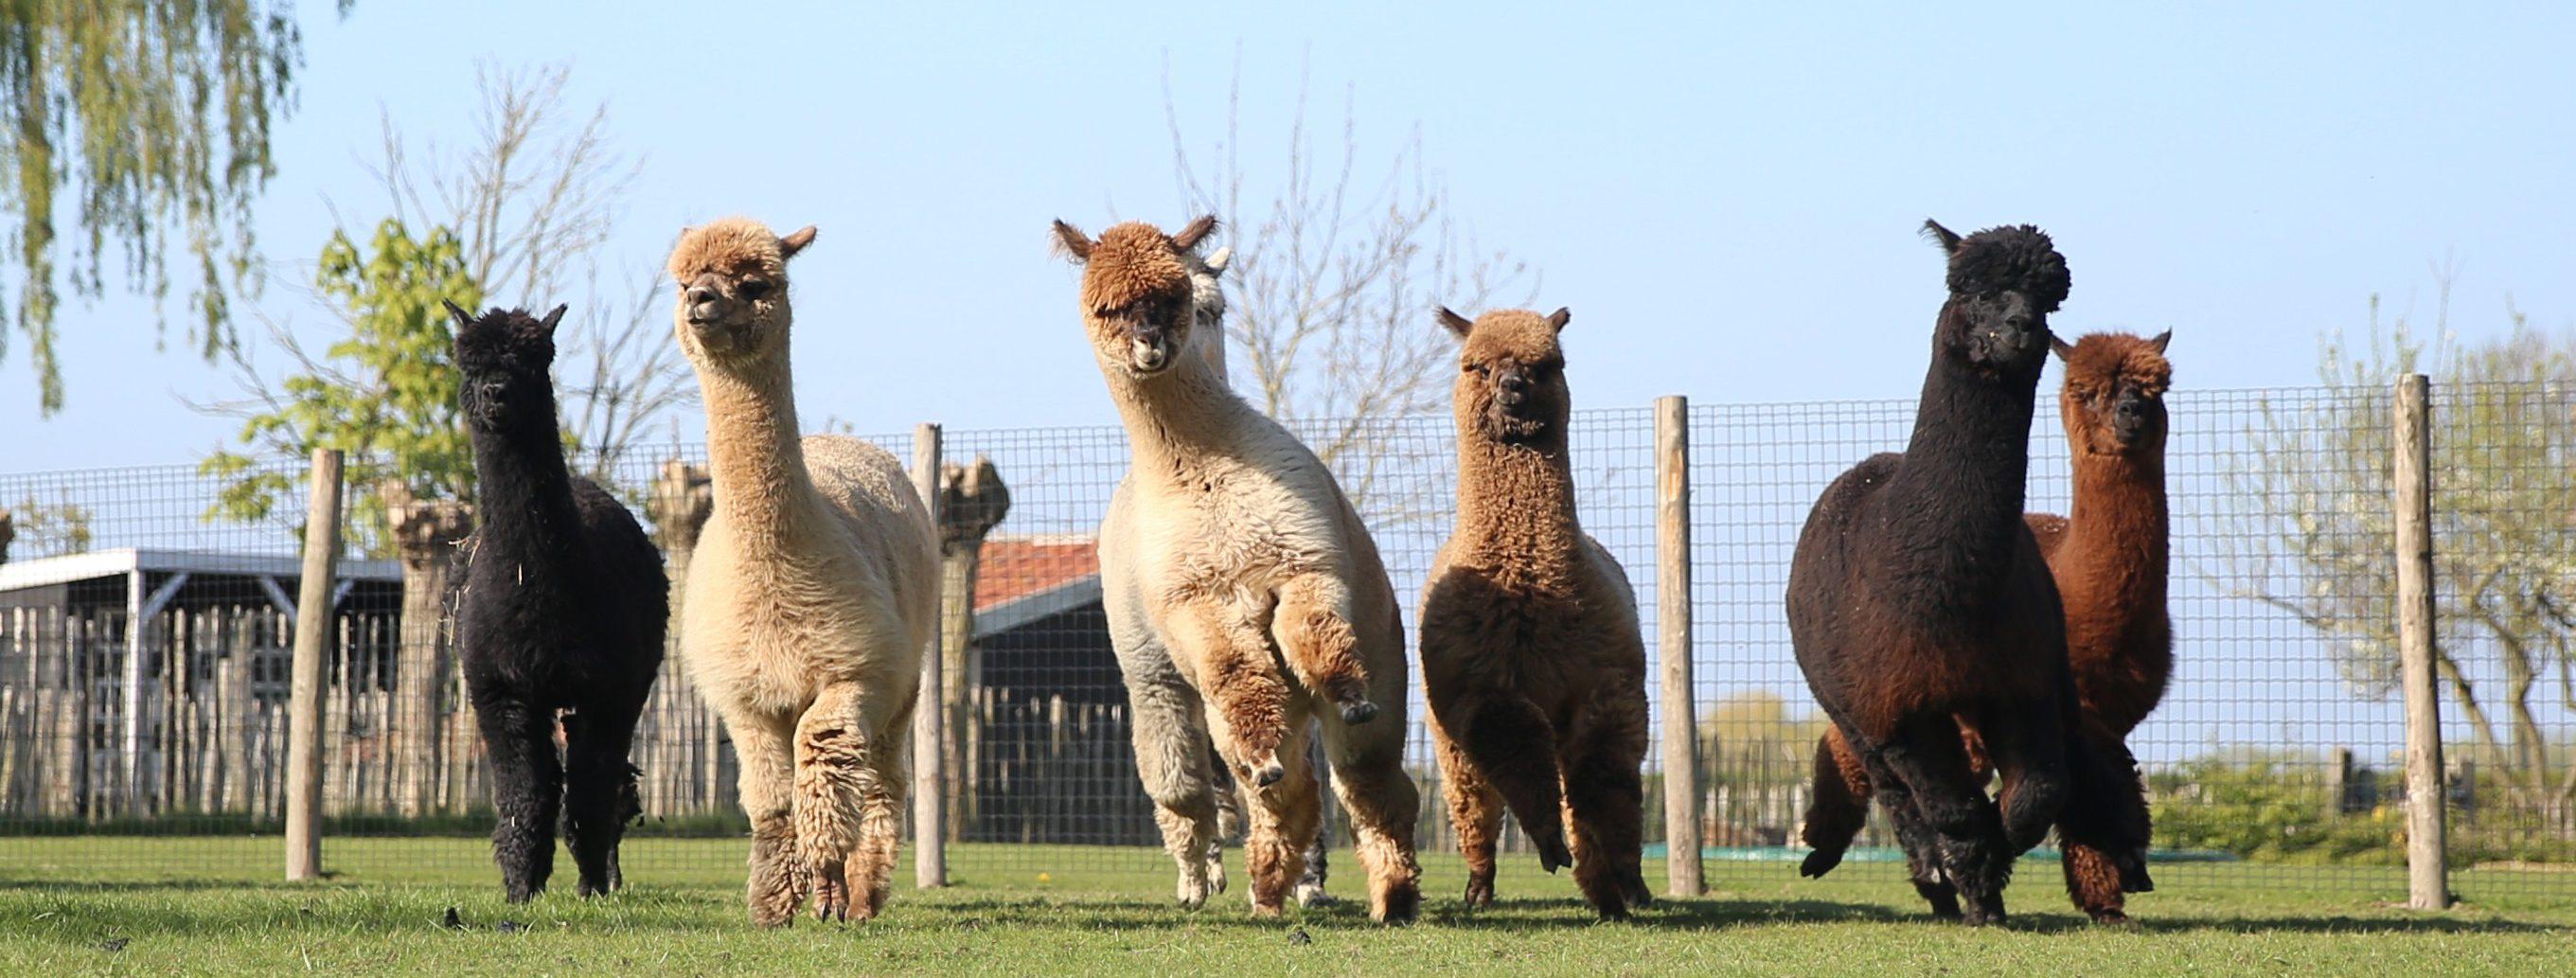 Alpacas running